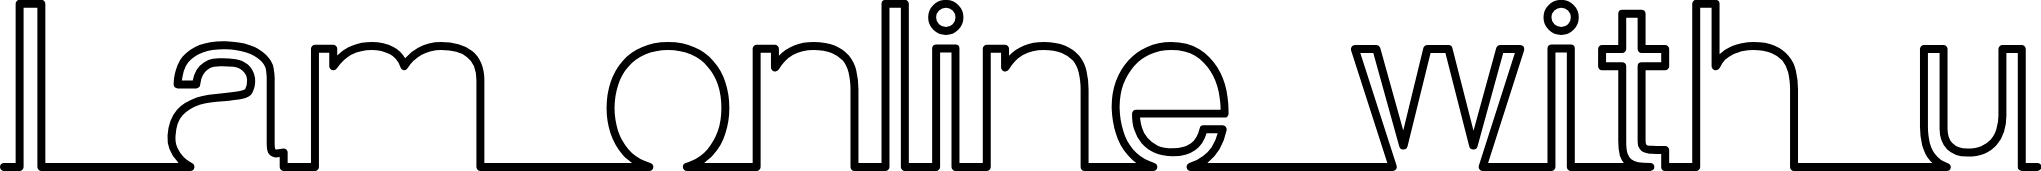 Free single line font for cnc